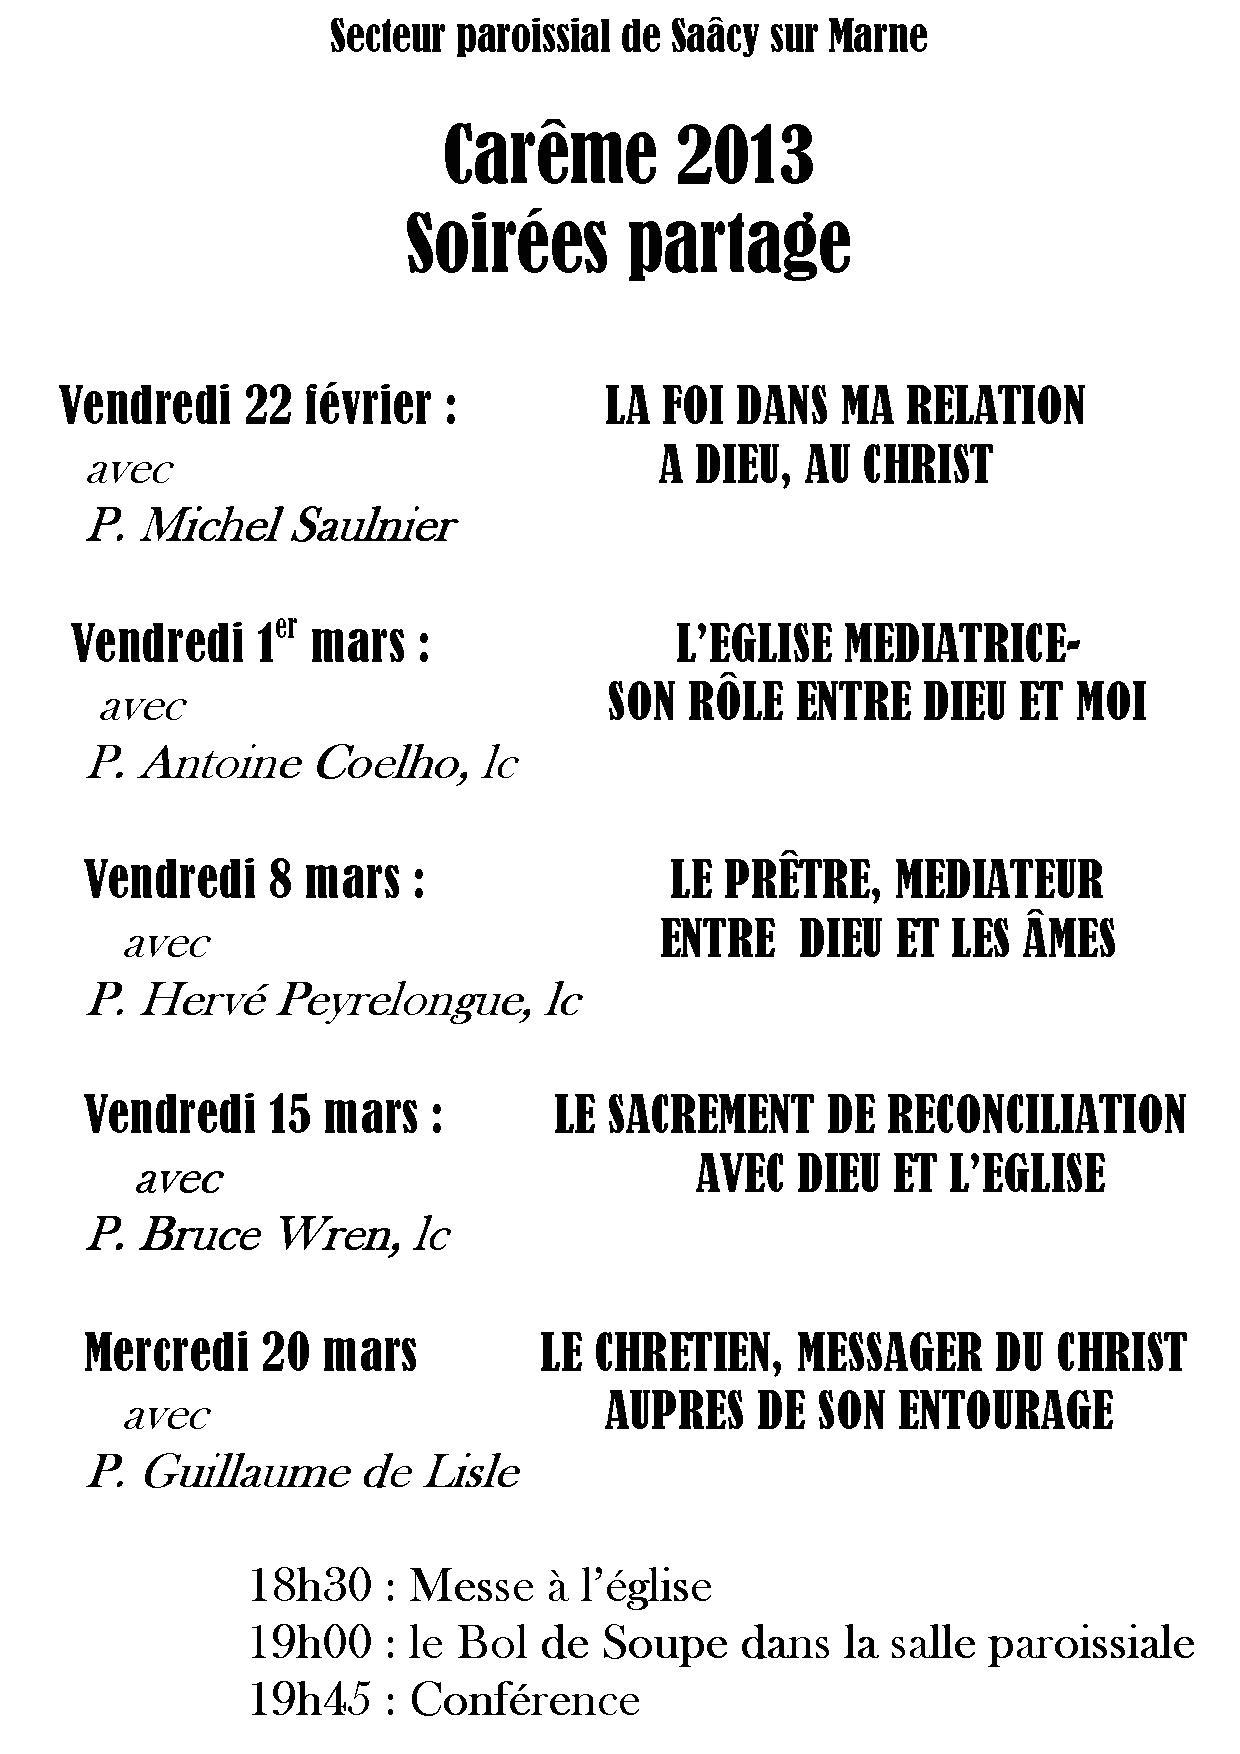 Saâcy Carême 2013